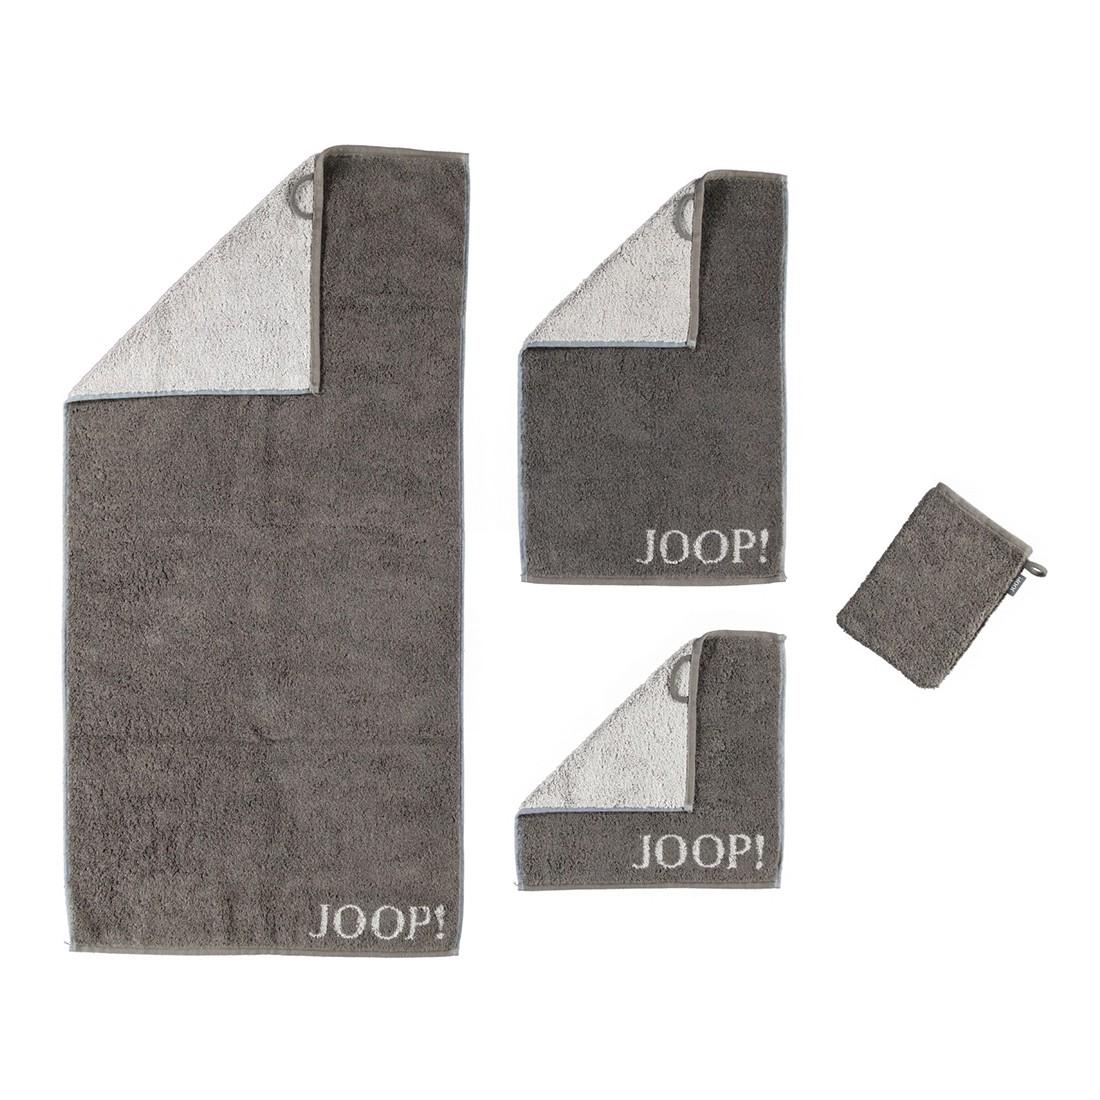 Handtuch Classic Doubleface – 100% Baumwolle Mokka – 33 – Handtuch: 50 x 100 cm, Joop jetzt bestellen